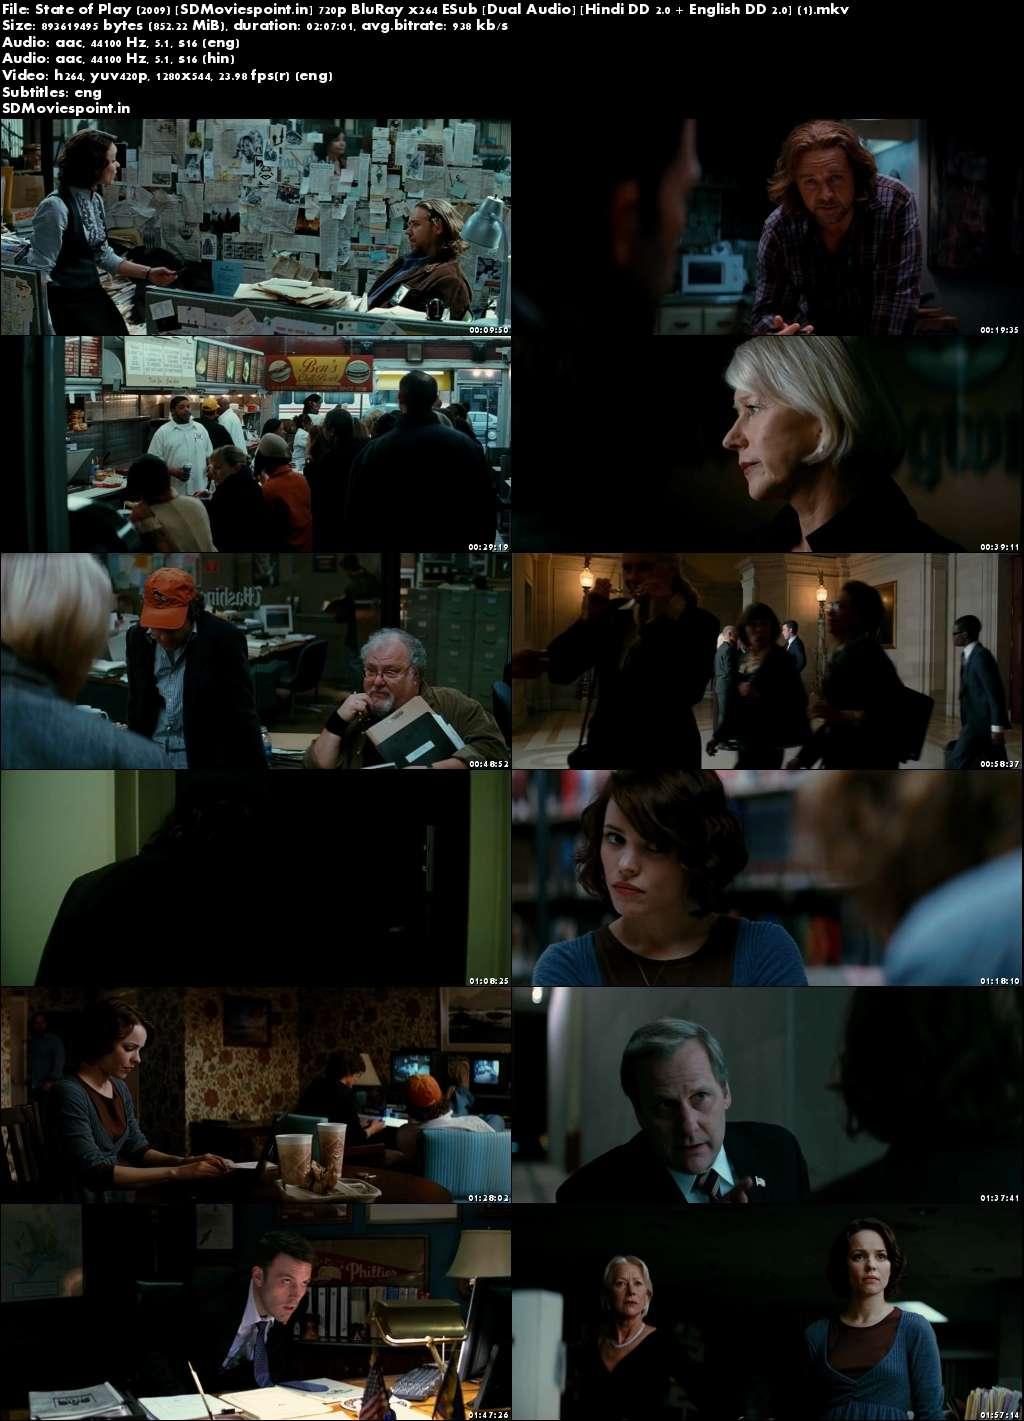 Screen Shots State of Play (2009) Full HD Movie Download Dual Audio Hindi Free 720p